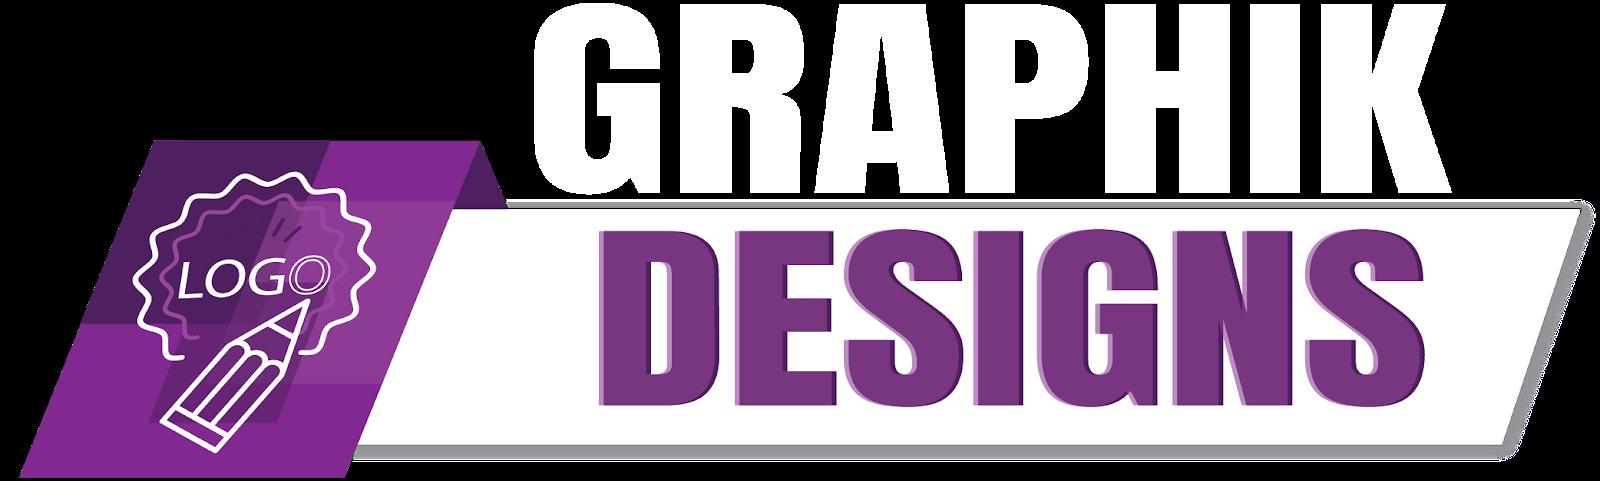 Graphik Designs